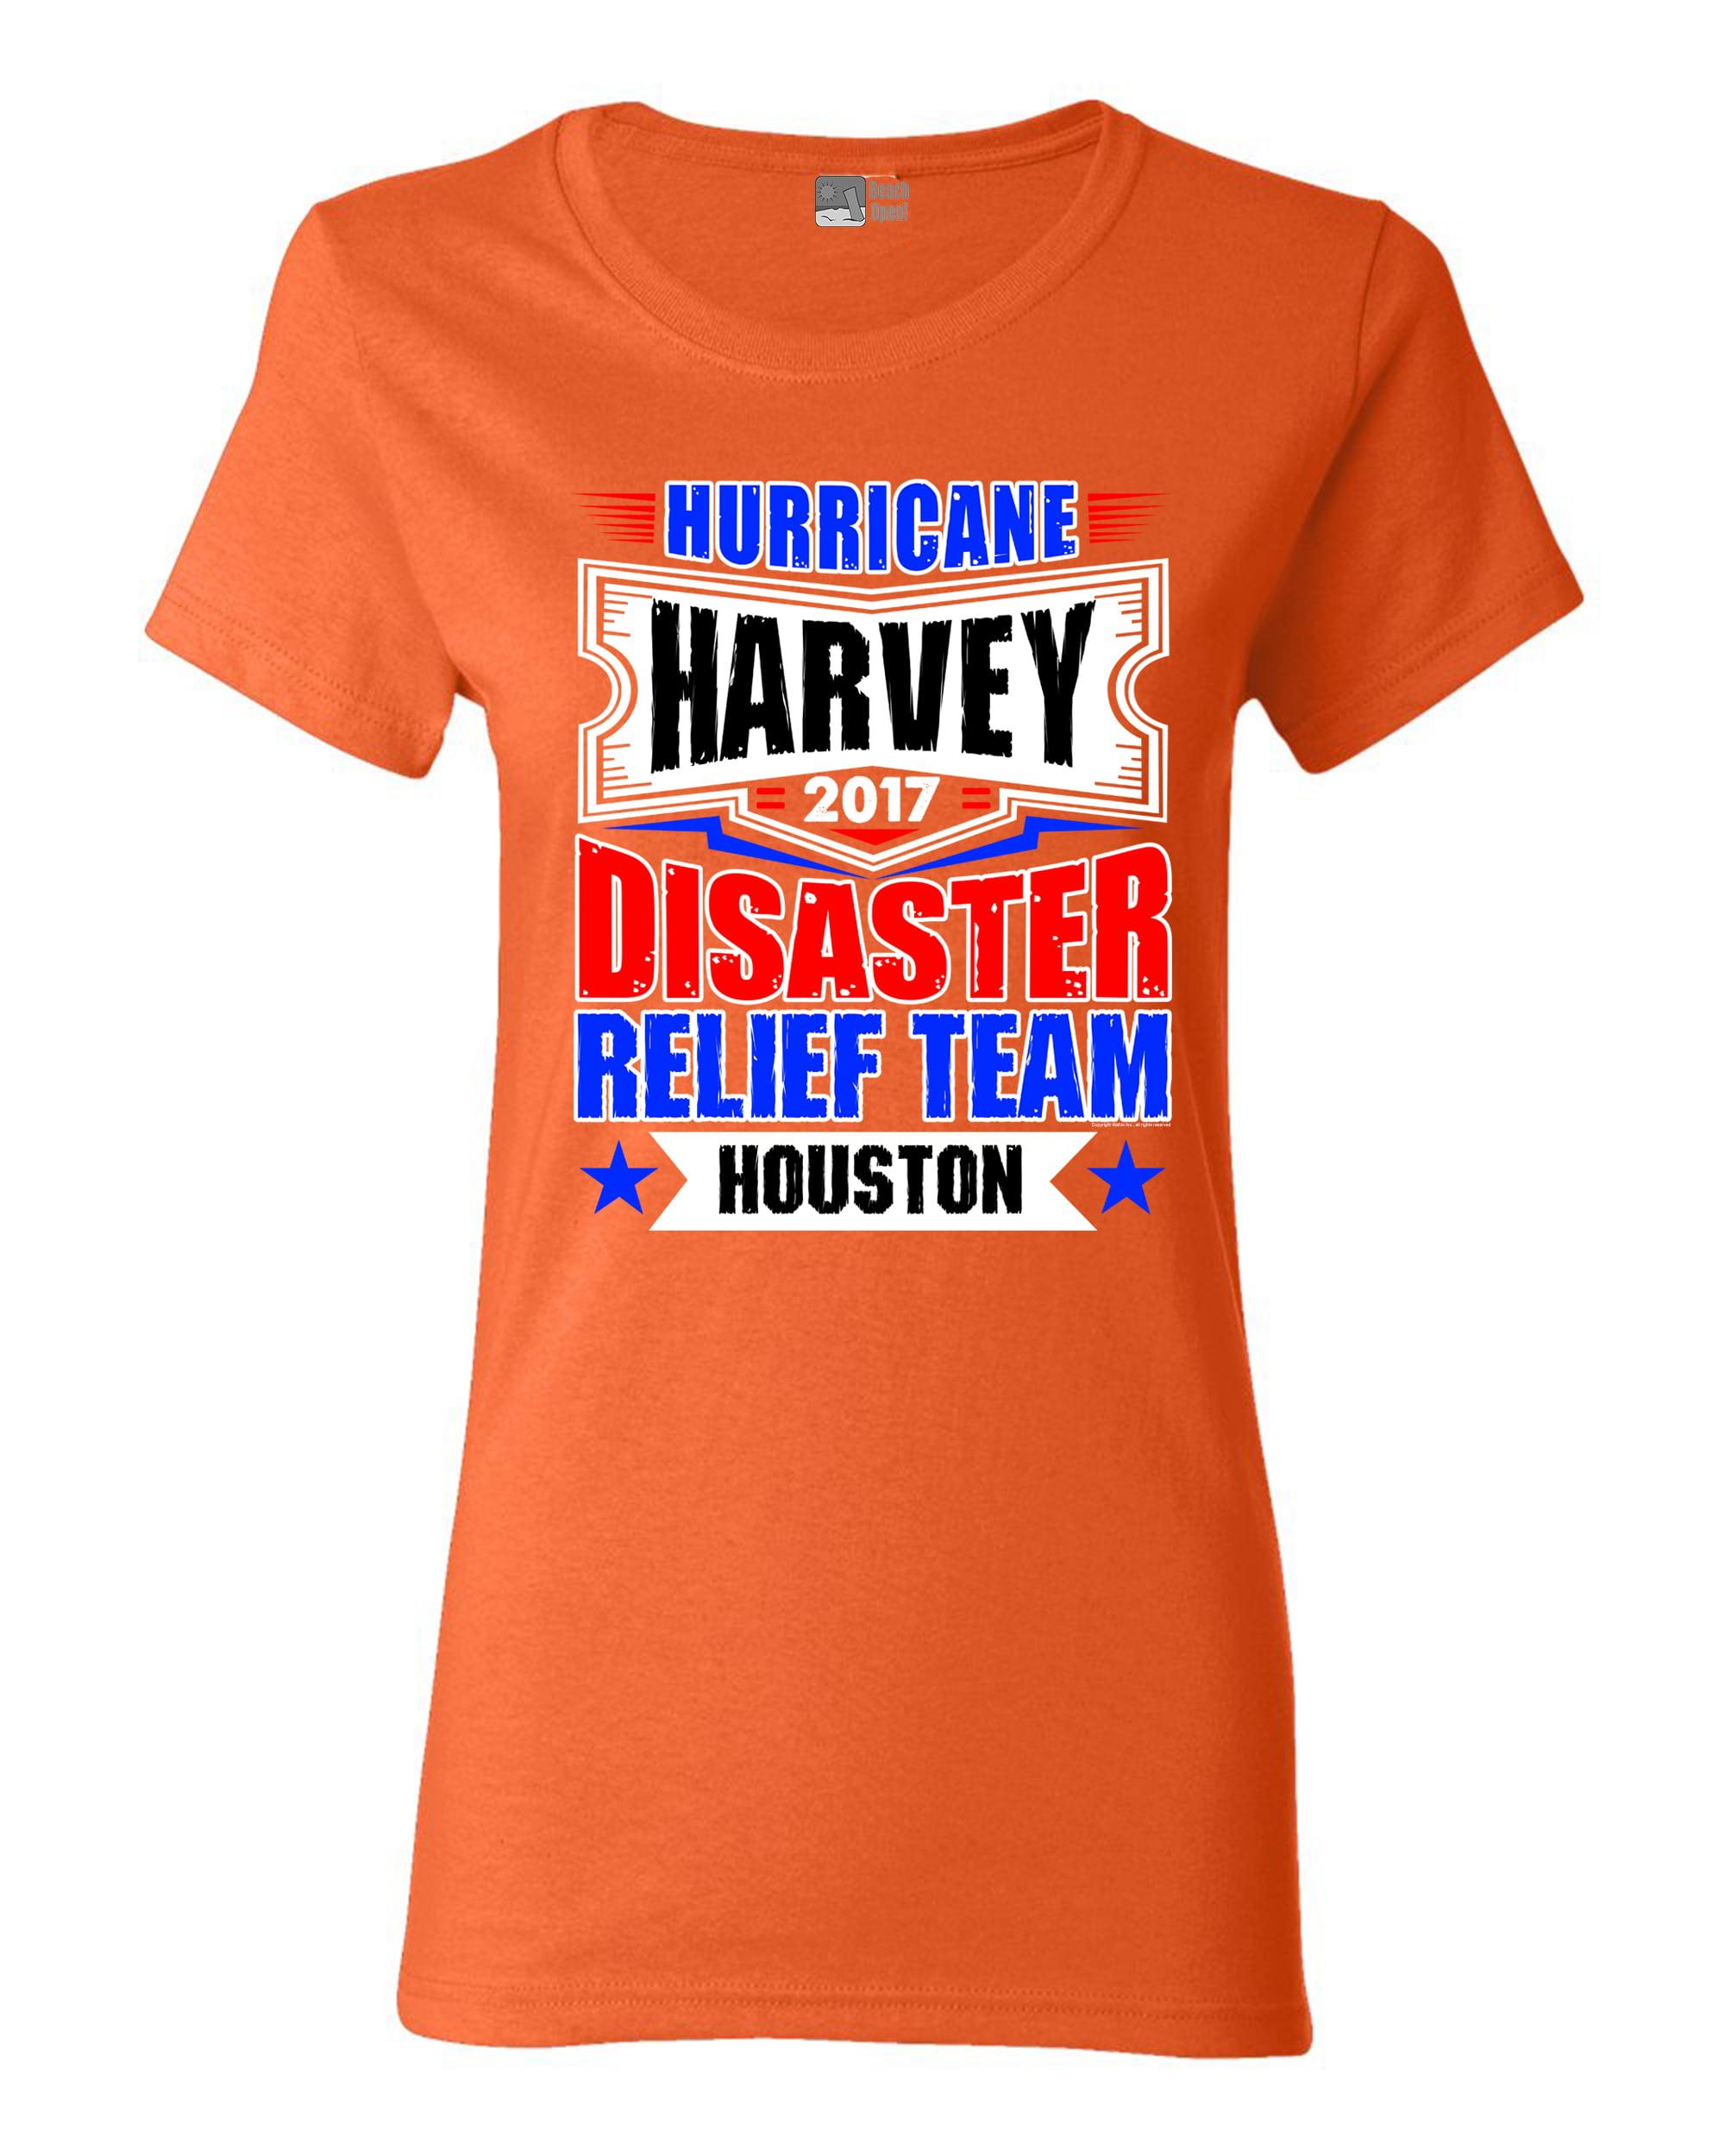 Ladies Hurricane Harvey Disaster Relief Team Houston 2017 DT T-Shirt Tee